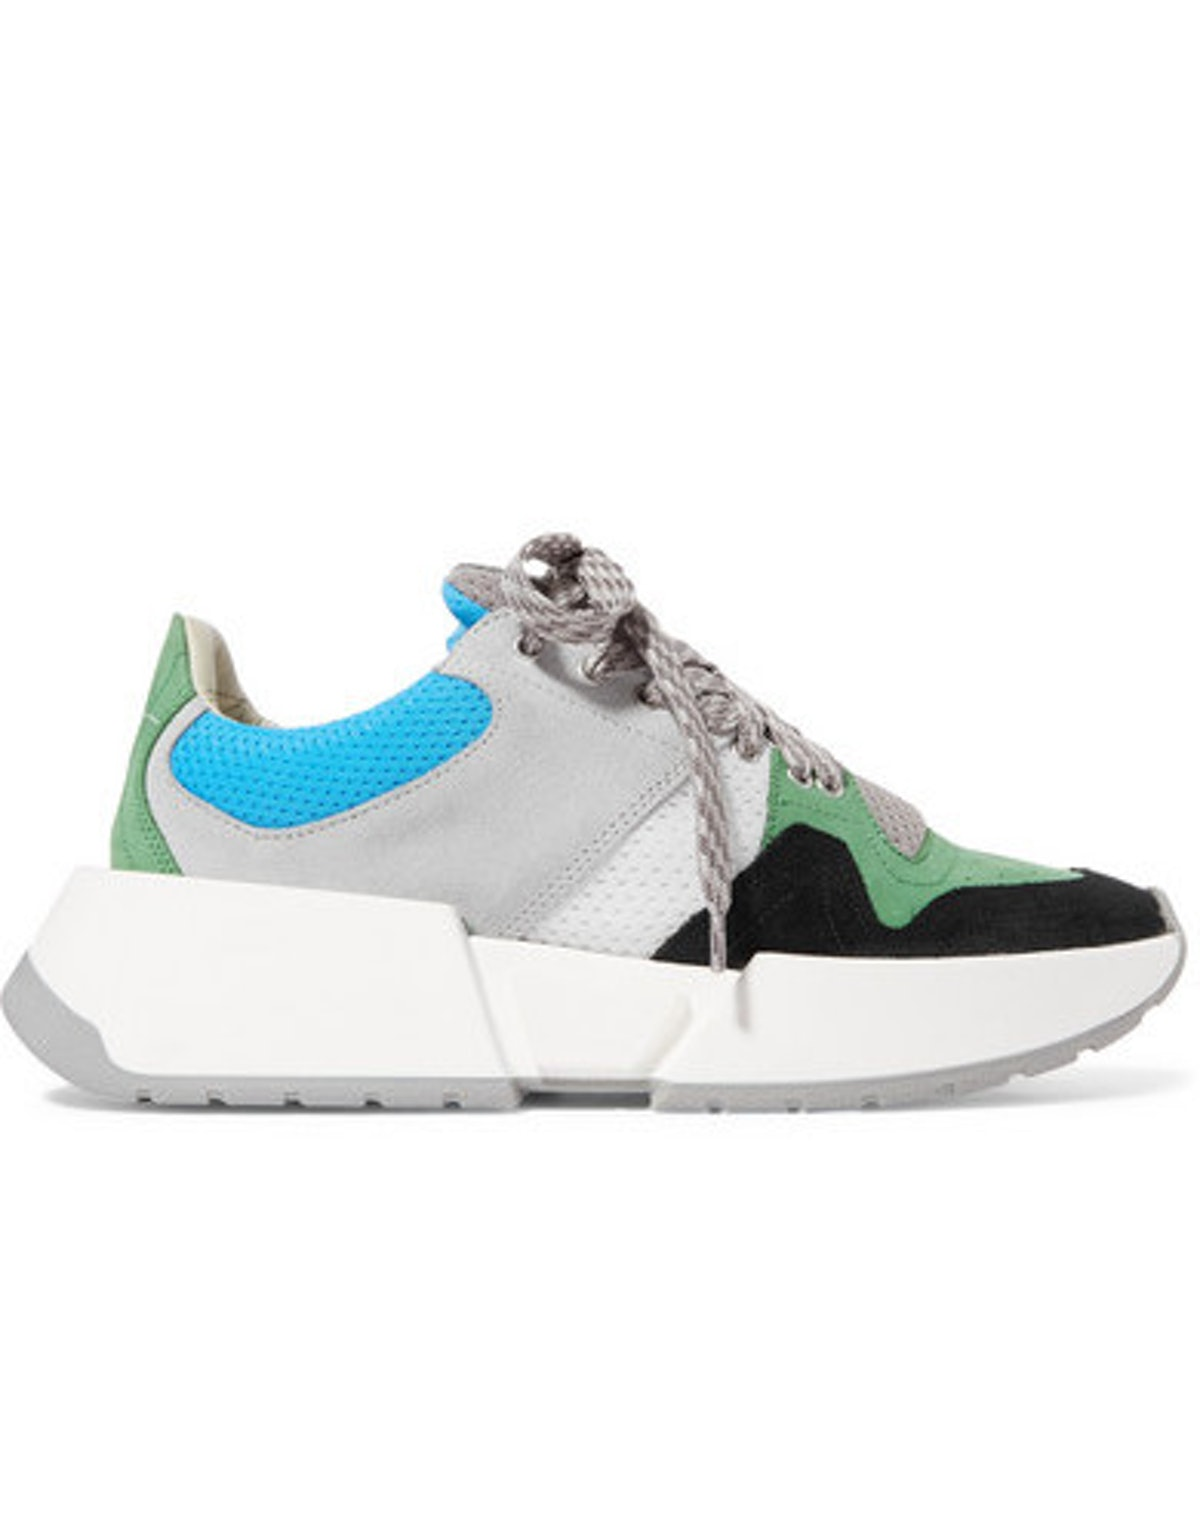 Runner Mesh And Nubuck Sneakers